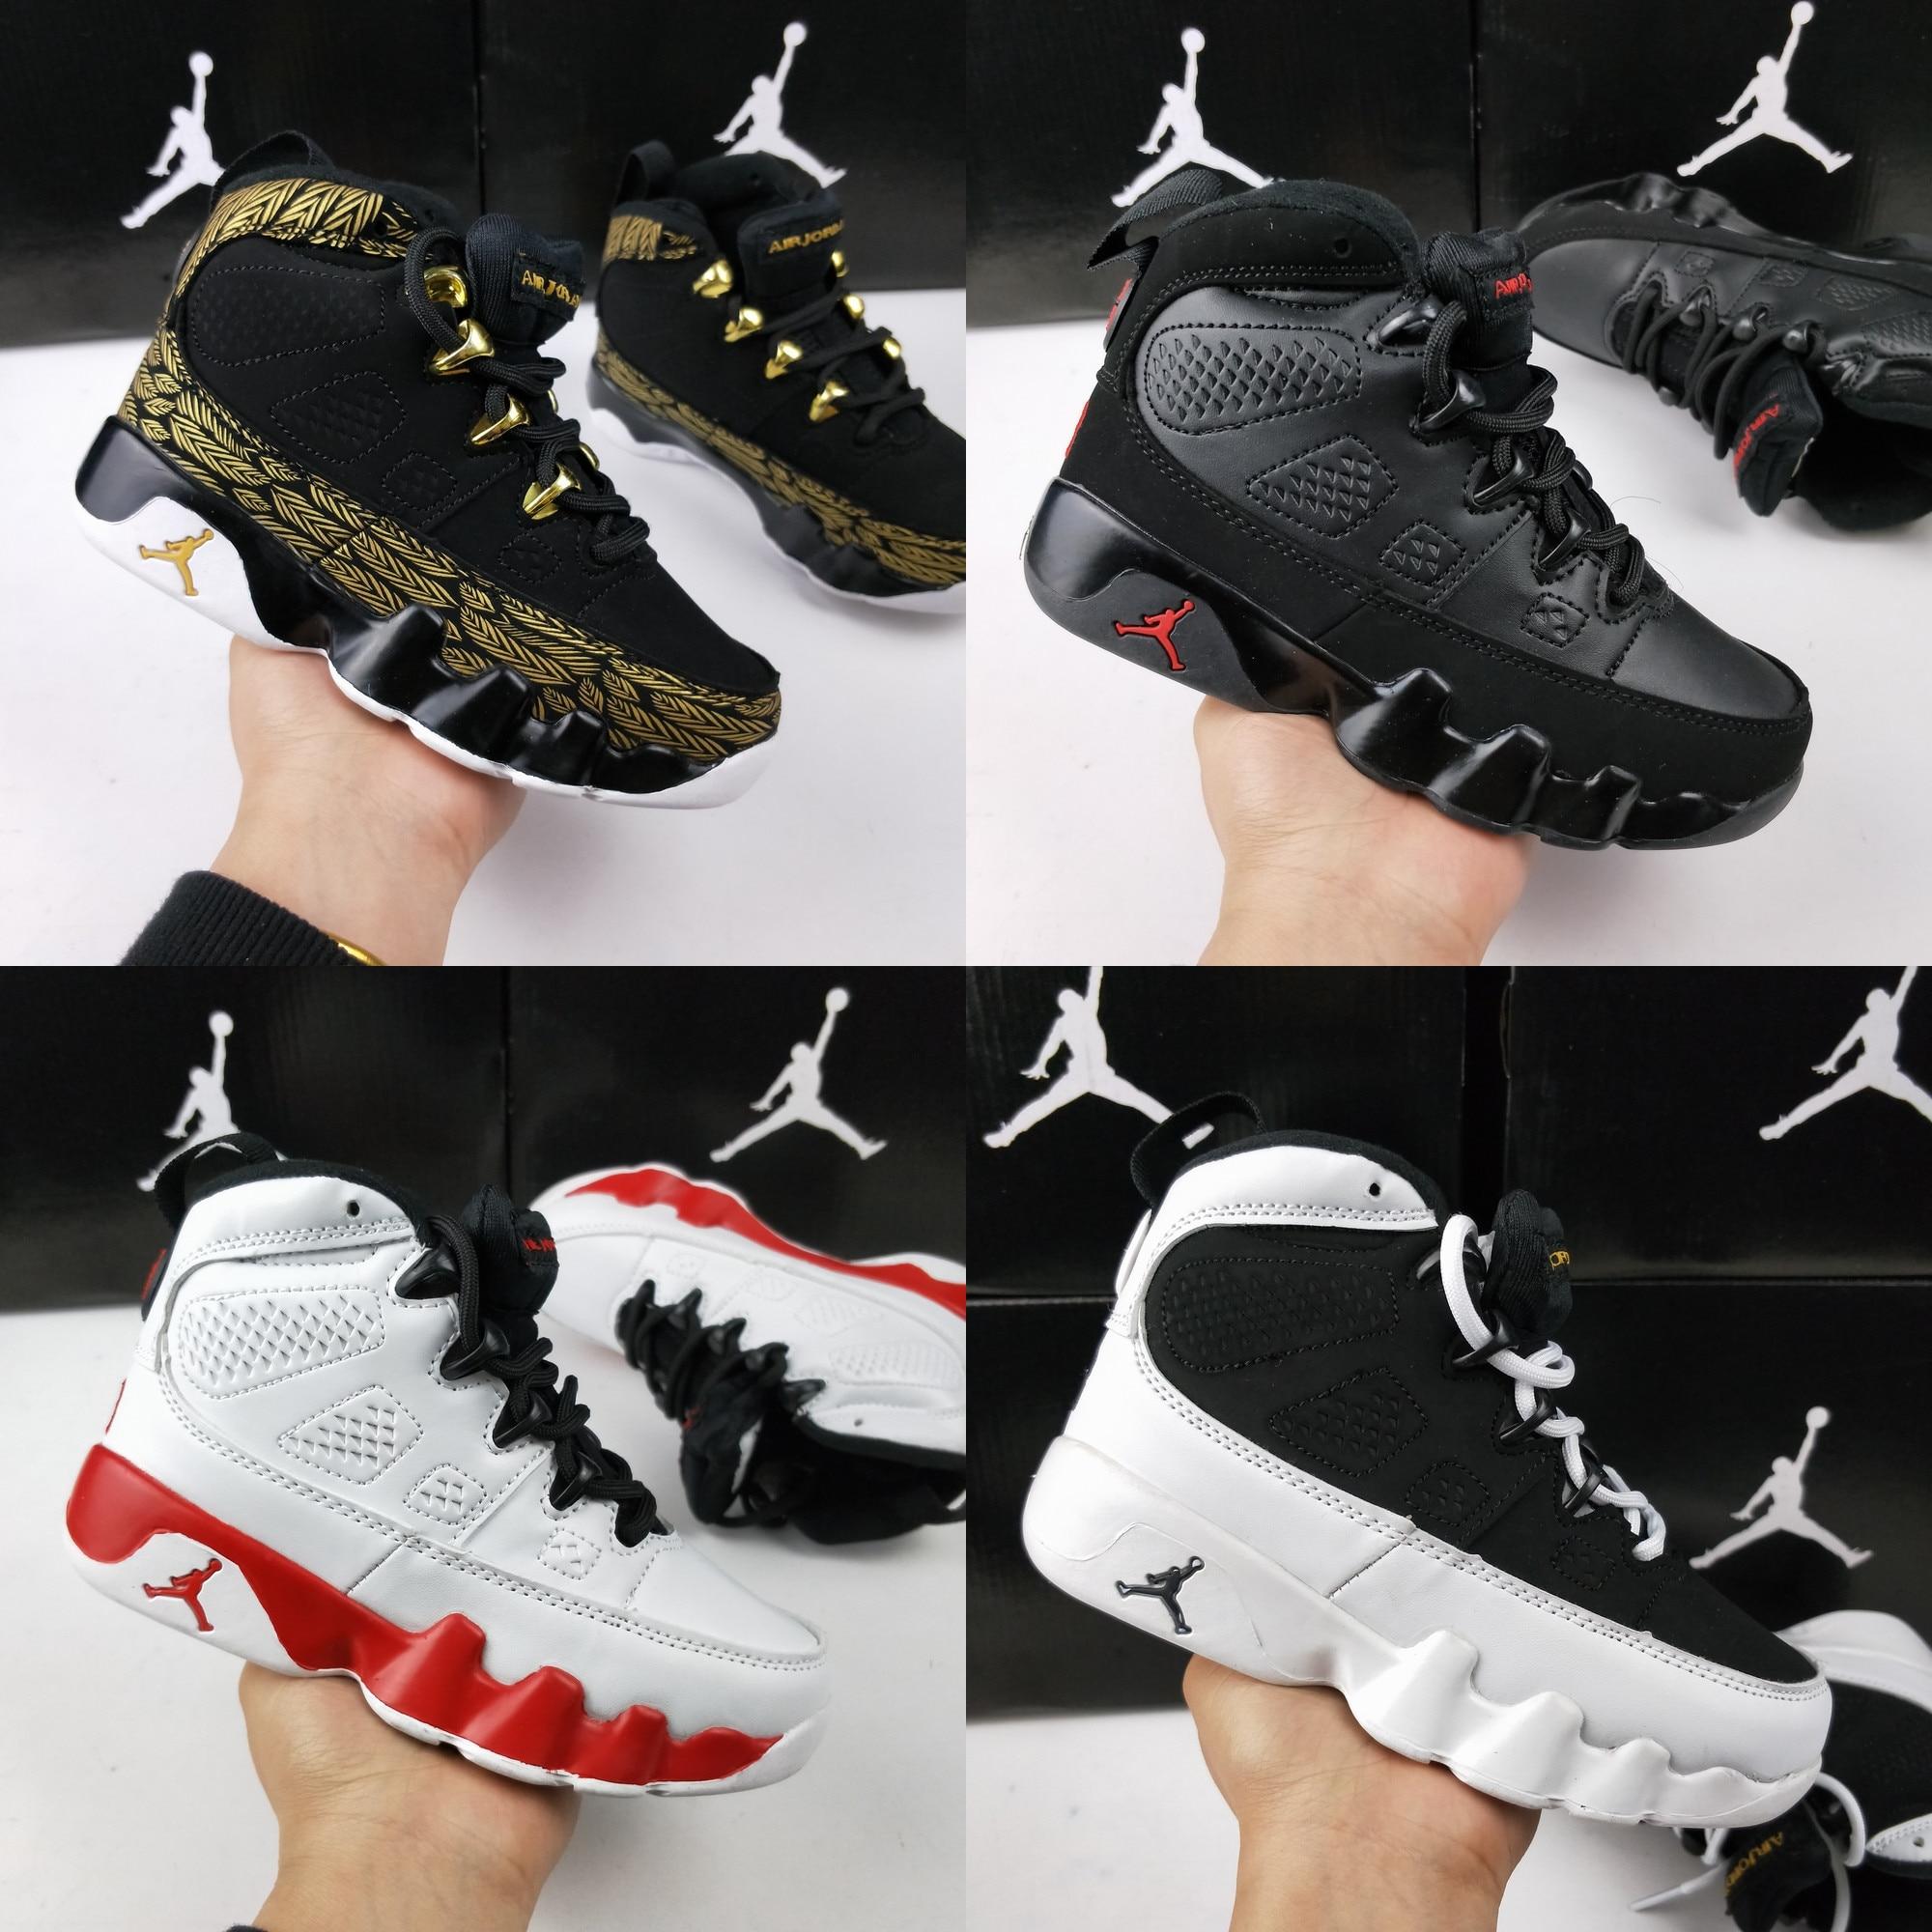 Basketball-Shoes Air-Jordan Bred Retro Children Kid 9-Dream Jam It-Do-It-Unc IX 28-35